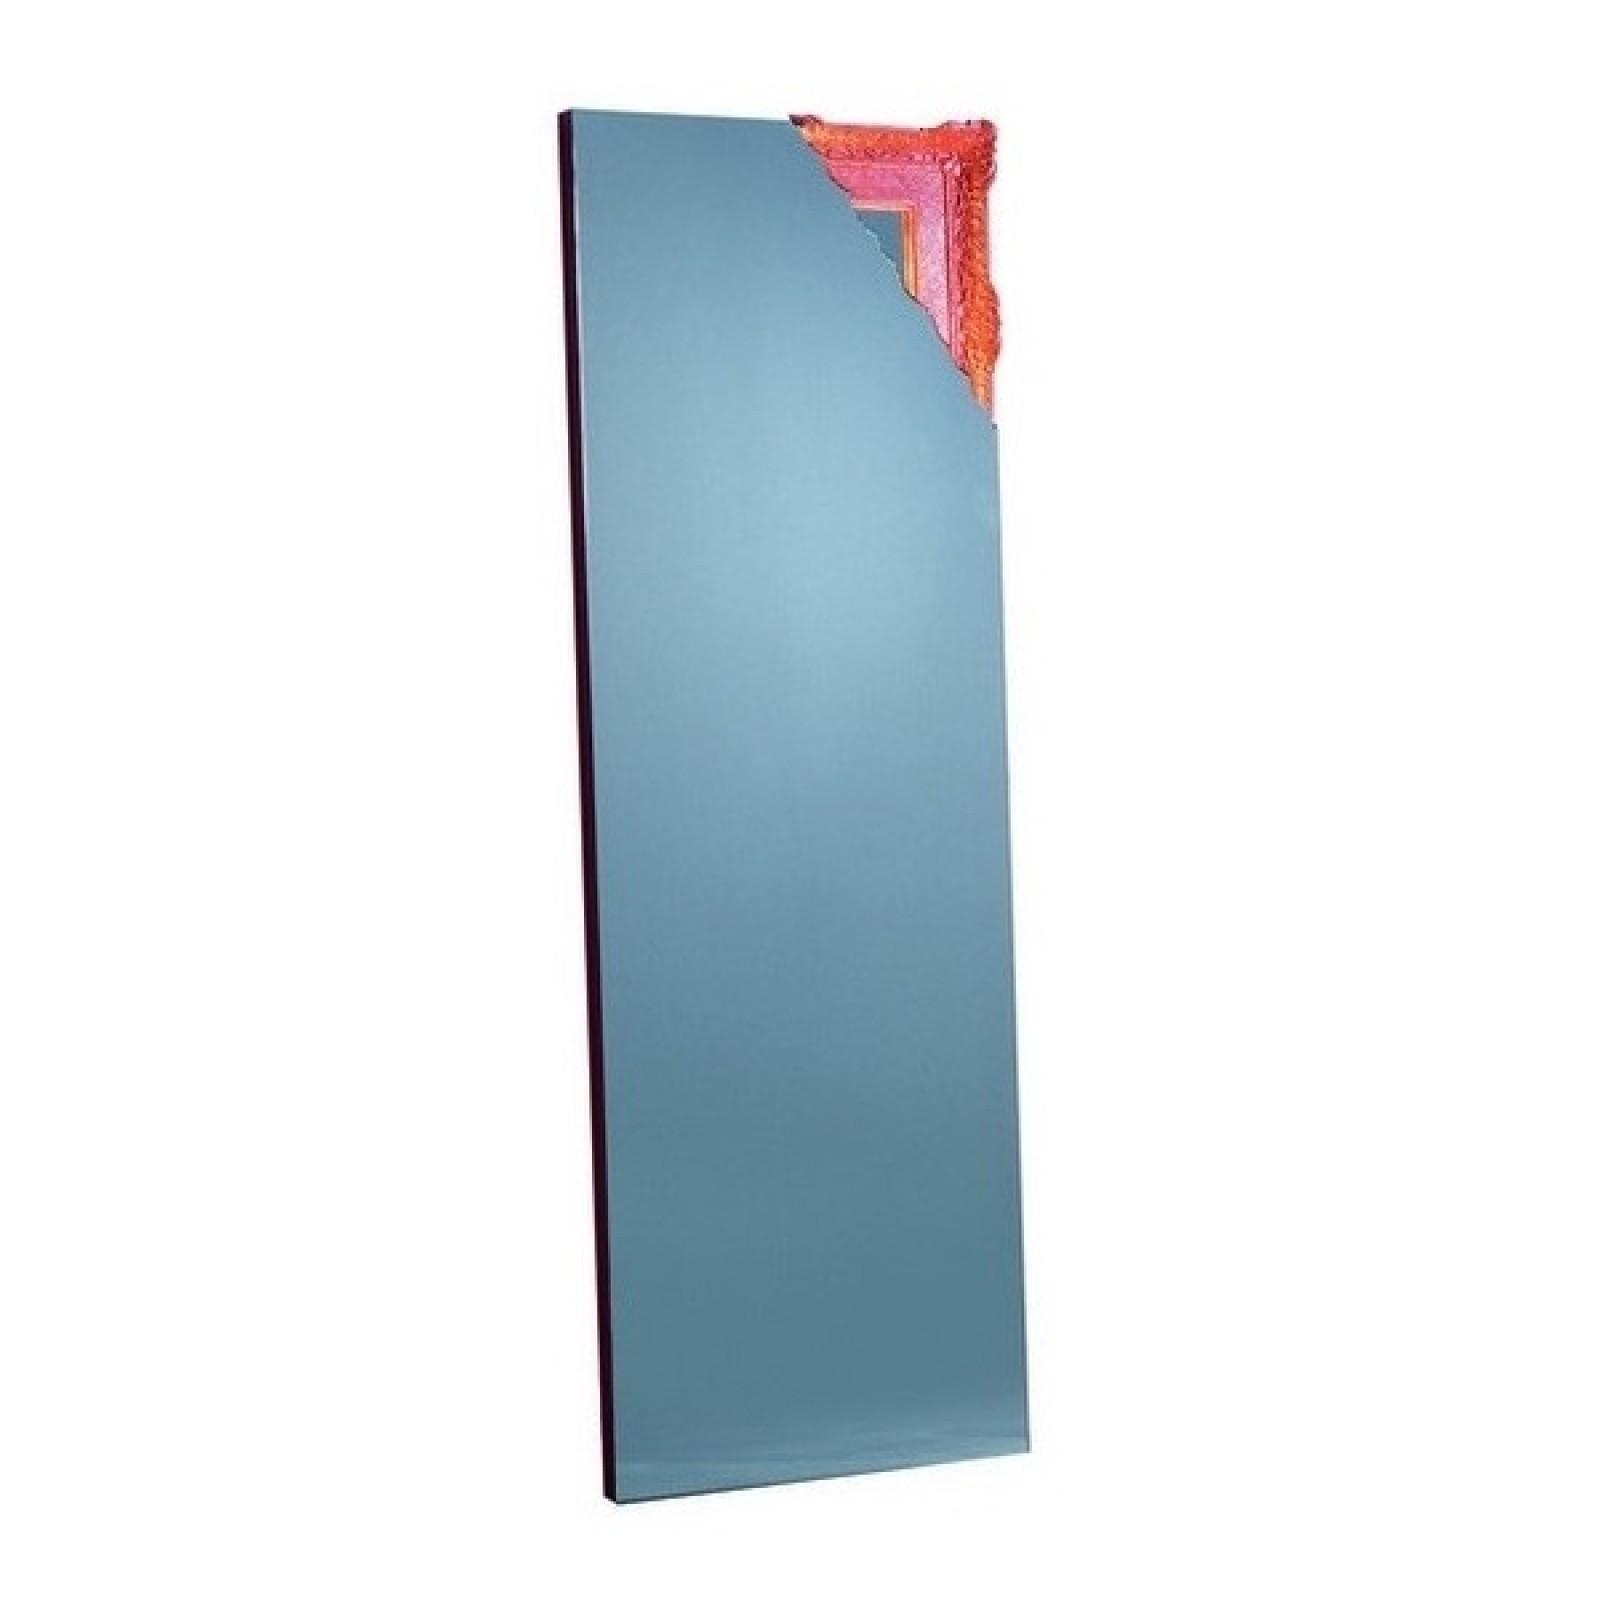 Breccia Mirror - miniforms